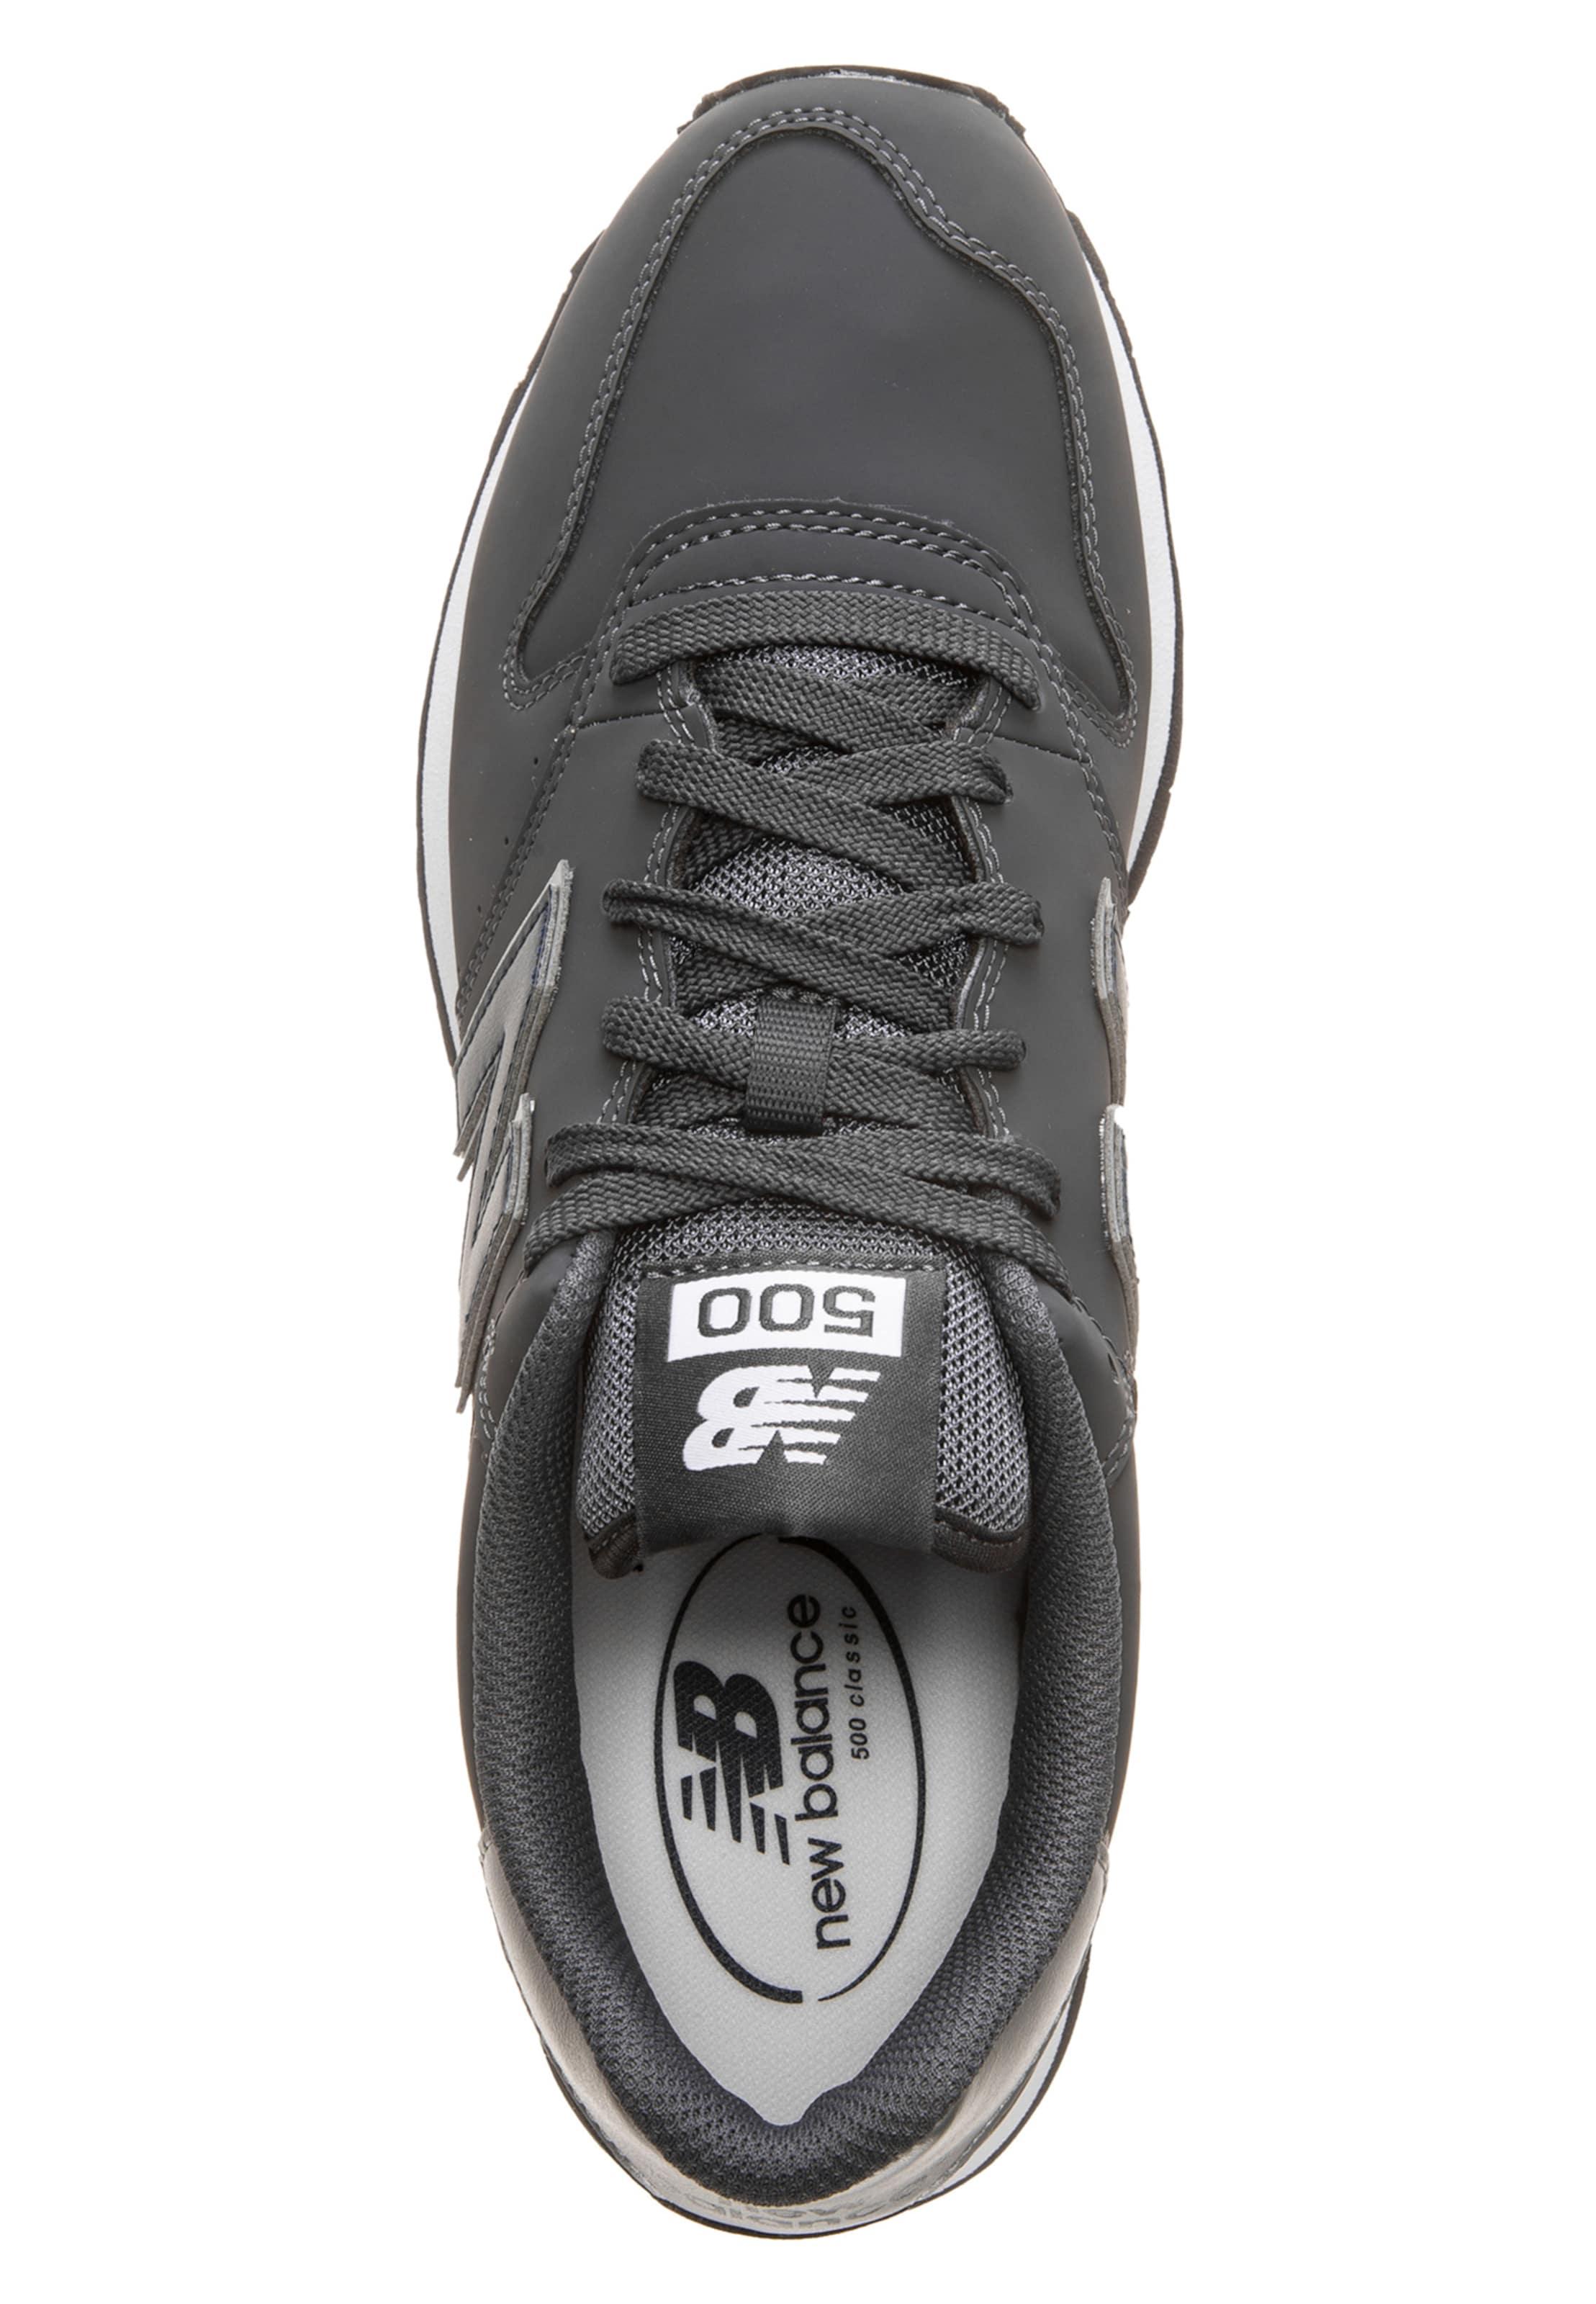 New d' mnn In 'gm500 NavyGrau Sneaker Balance Basaltgrau nPO0wk